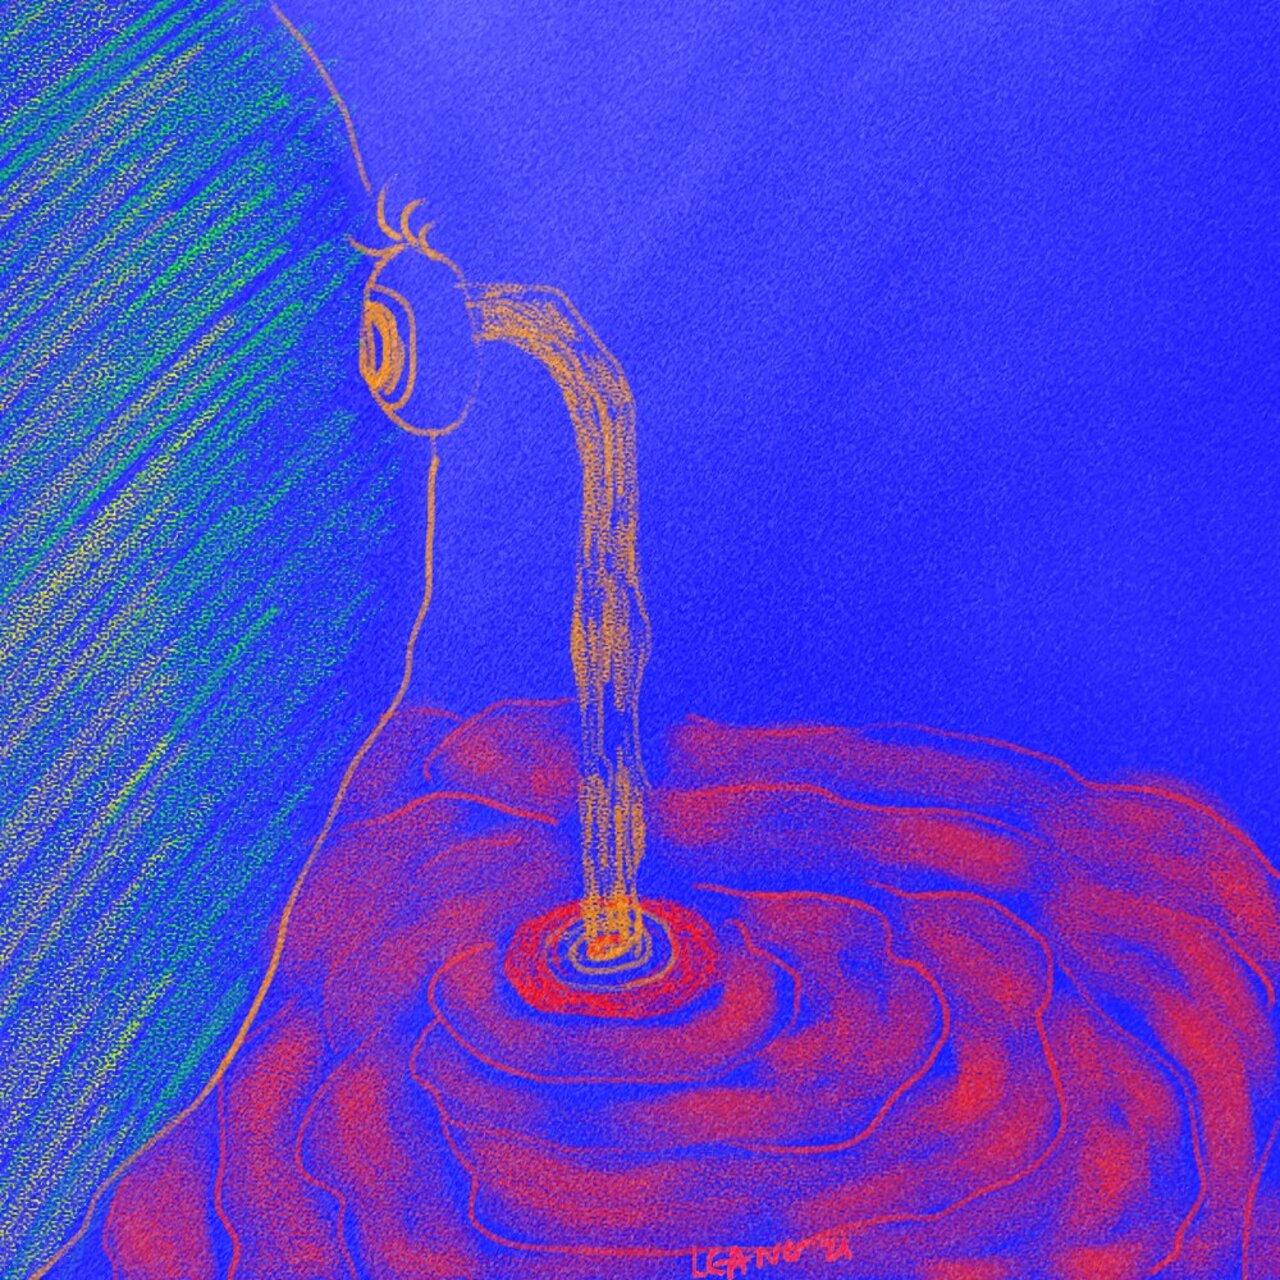 "rò rỉ tại <a href=""https://www.youtube.com/channel/UCrND69dvGwpqtx2THXeeuAQ"">Recording to heal the soul</a>"